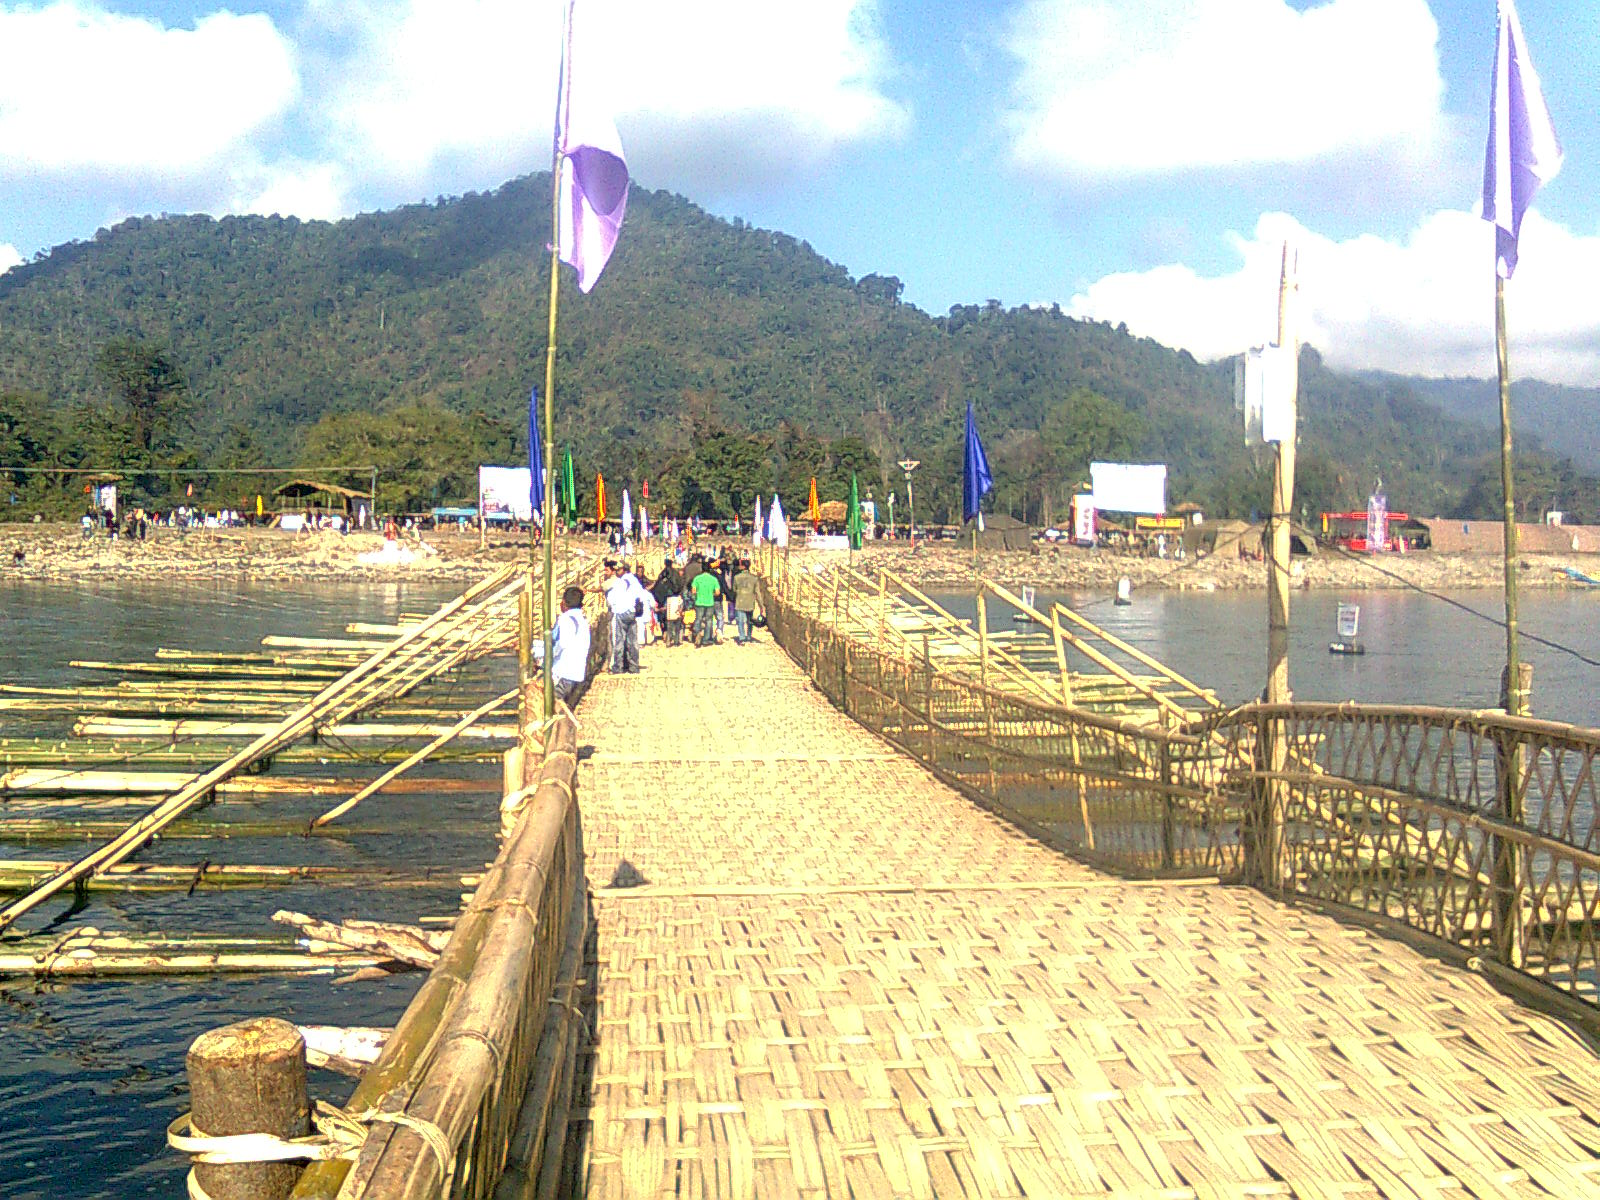 Amazing Festival Of Arunachal Pradesh-Siang River Festival (Yomgo River Festival)